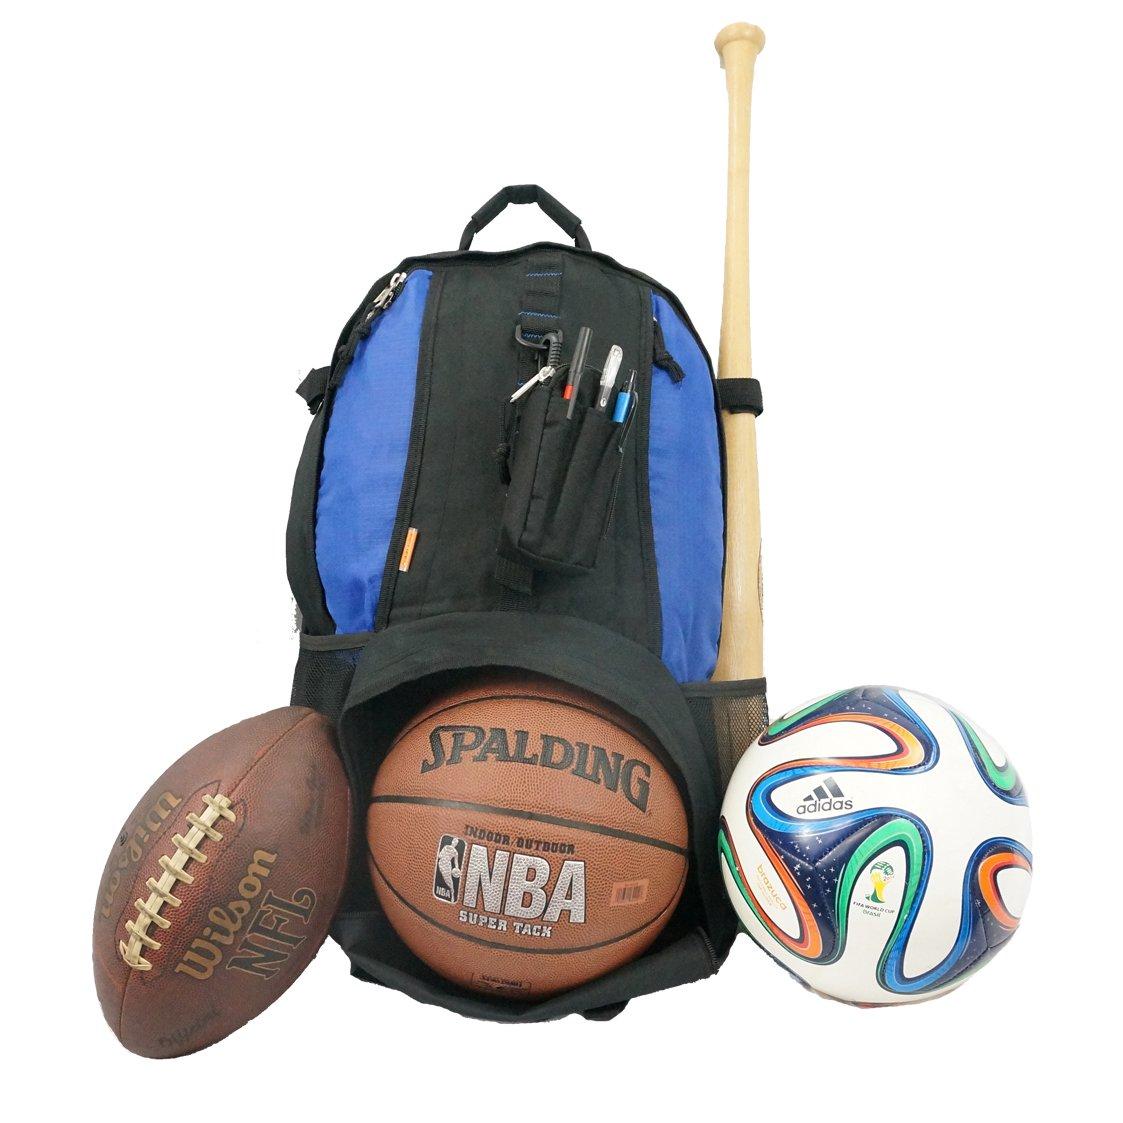 Baseball Backpack Softball Daypack Basketball Volleyball Backpack Football Soccer Bag w/ Ball Storage Helmet Compartment & Bat Holder & Coin Phone Pouch - Black/Blue